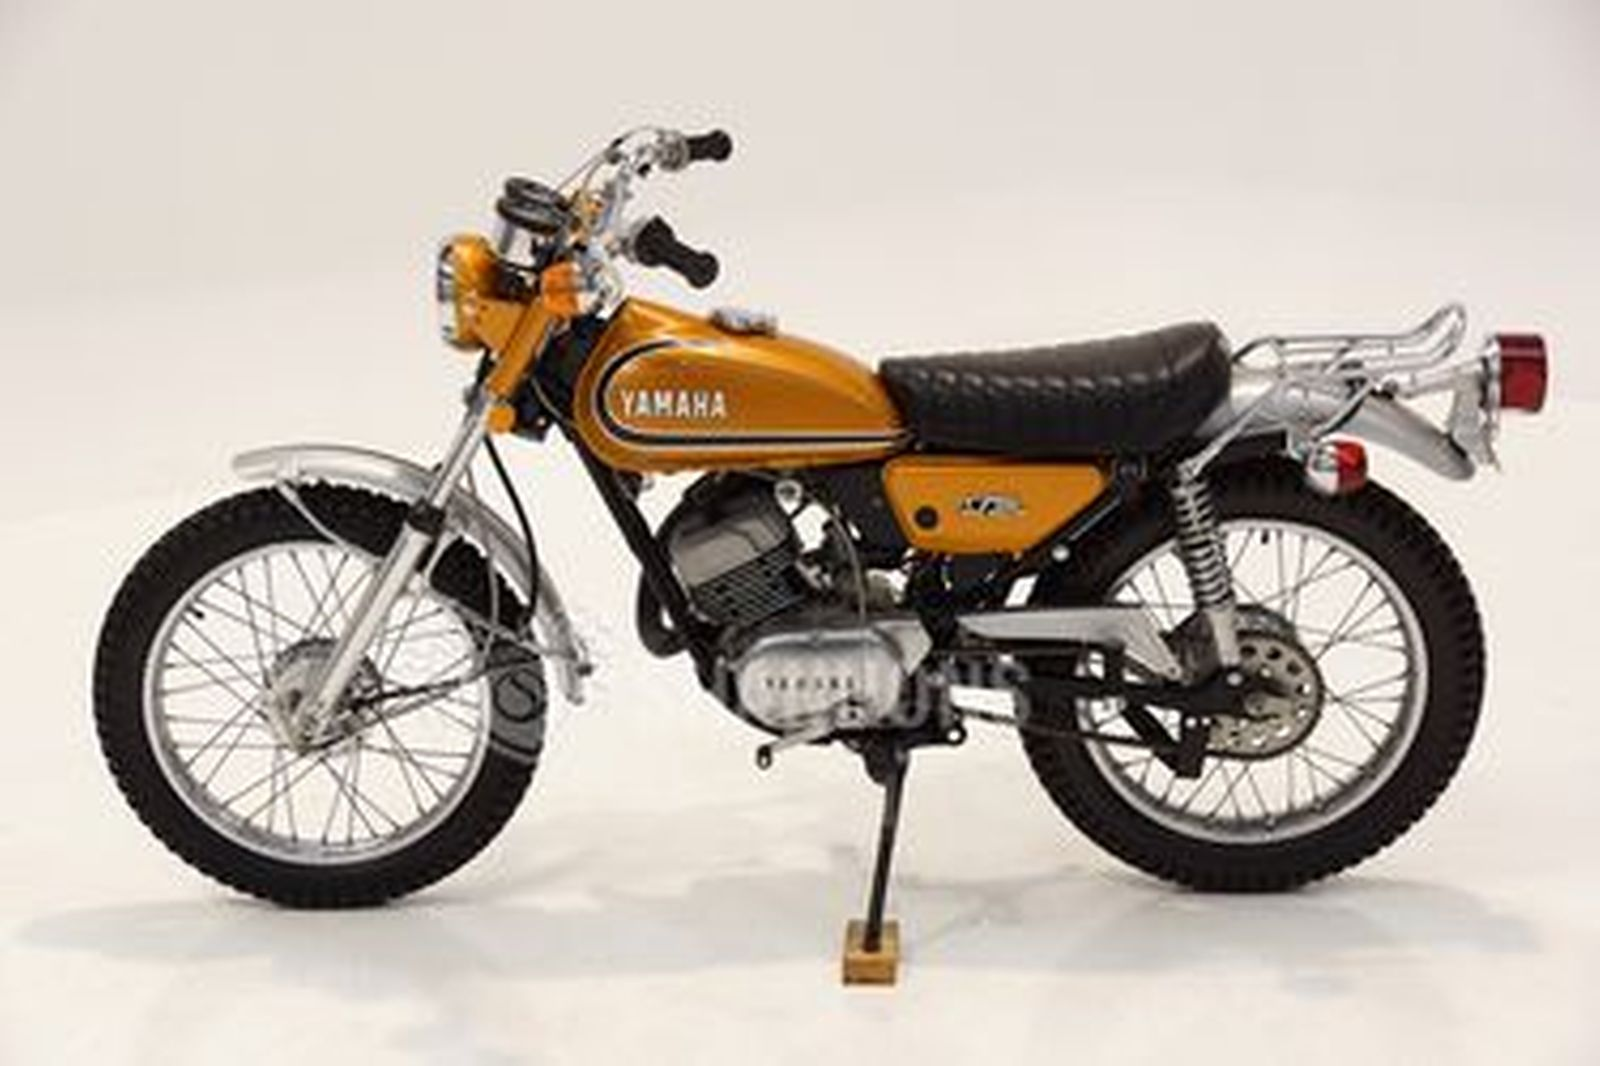 Yamaha CT175 Motorcycle